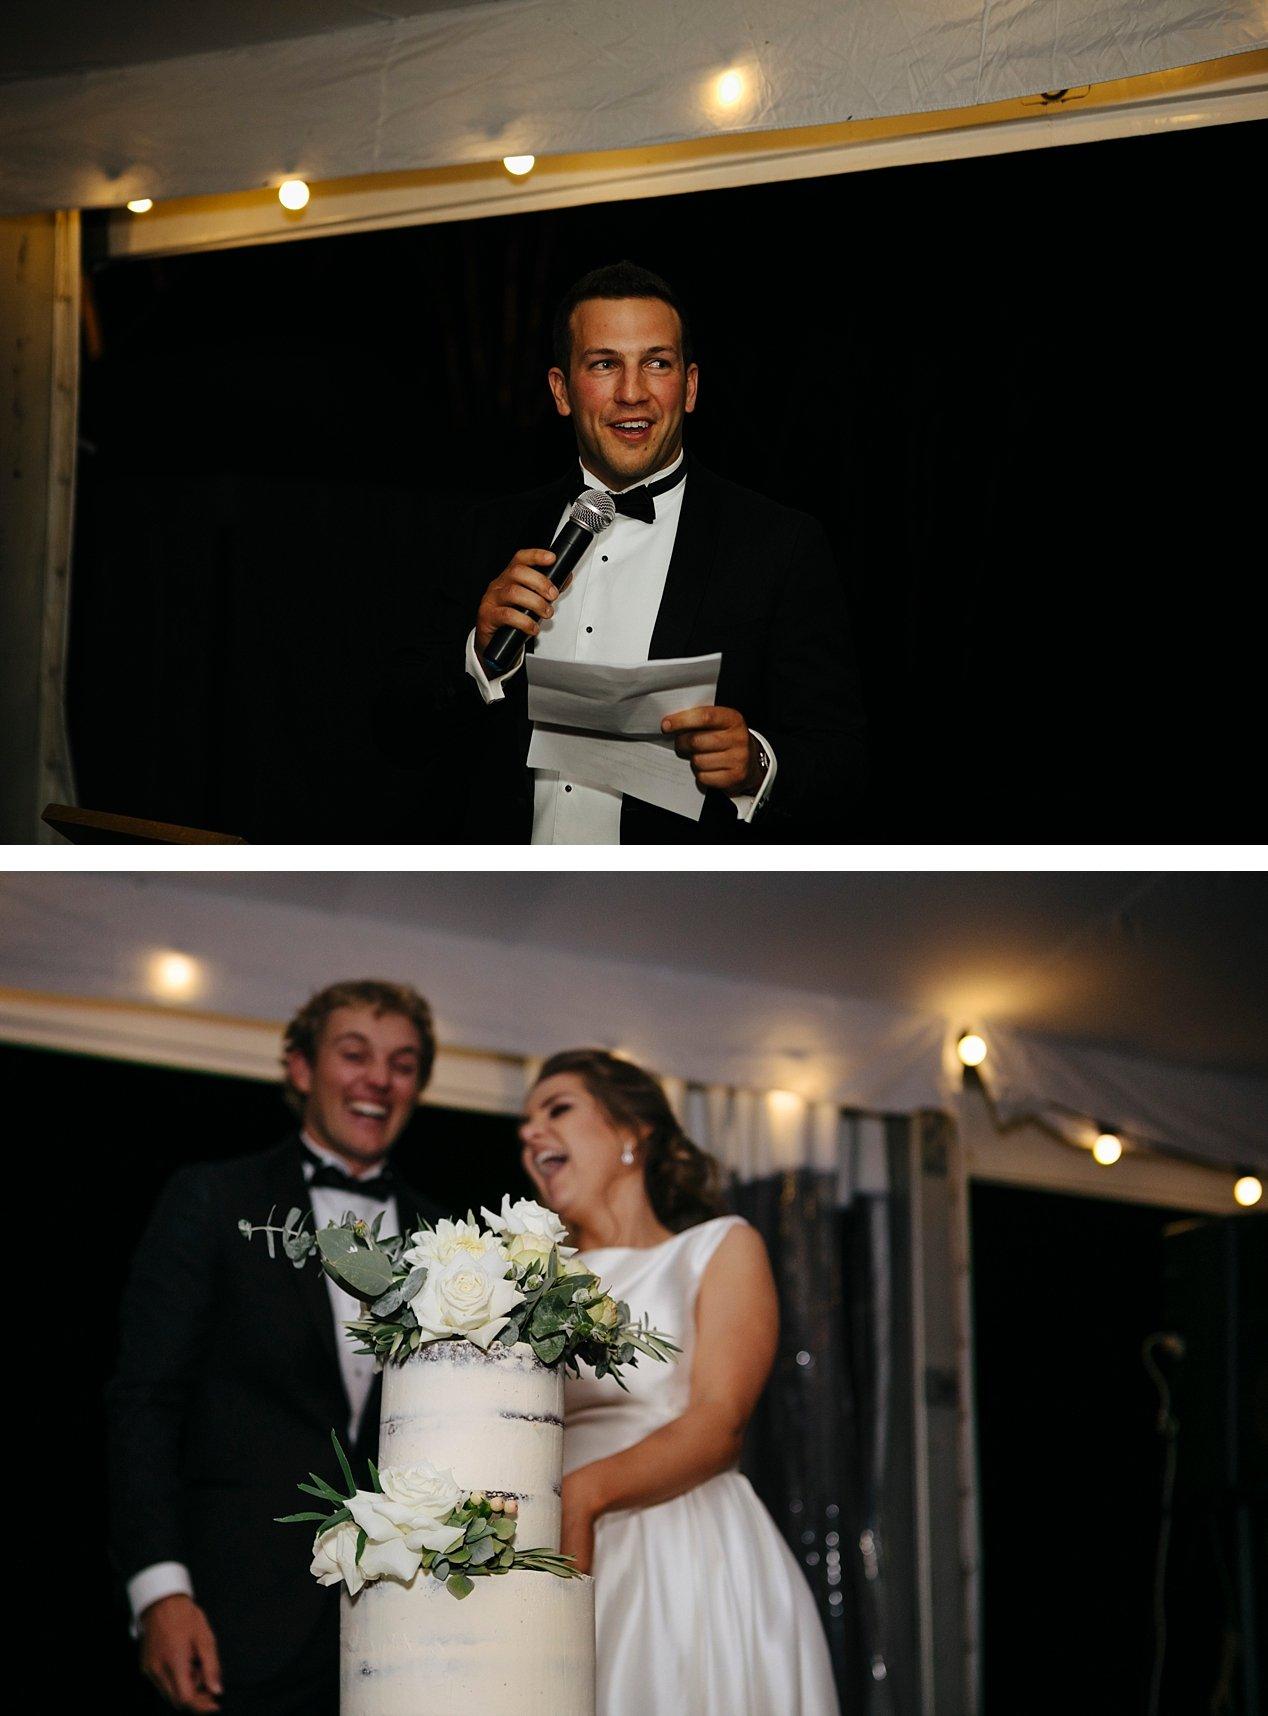 Deniliquin Jerilderie Wagga Wagga Wedding Photographer_The Crossing Deniliquin party caterers Deniliquin3